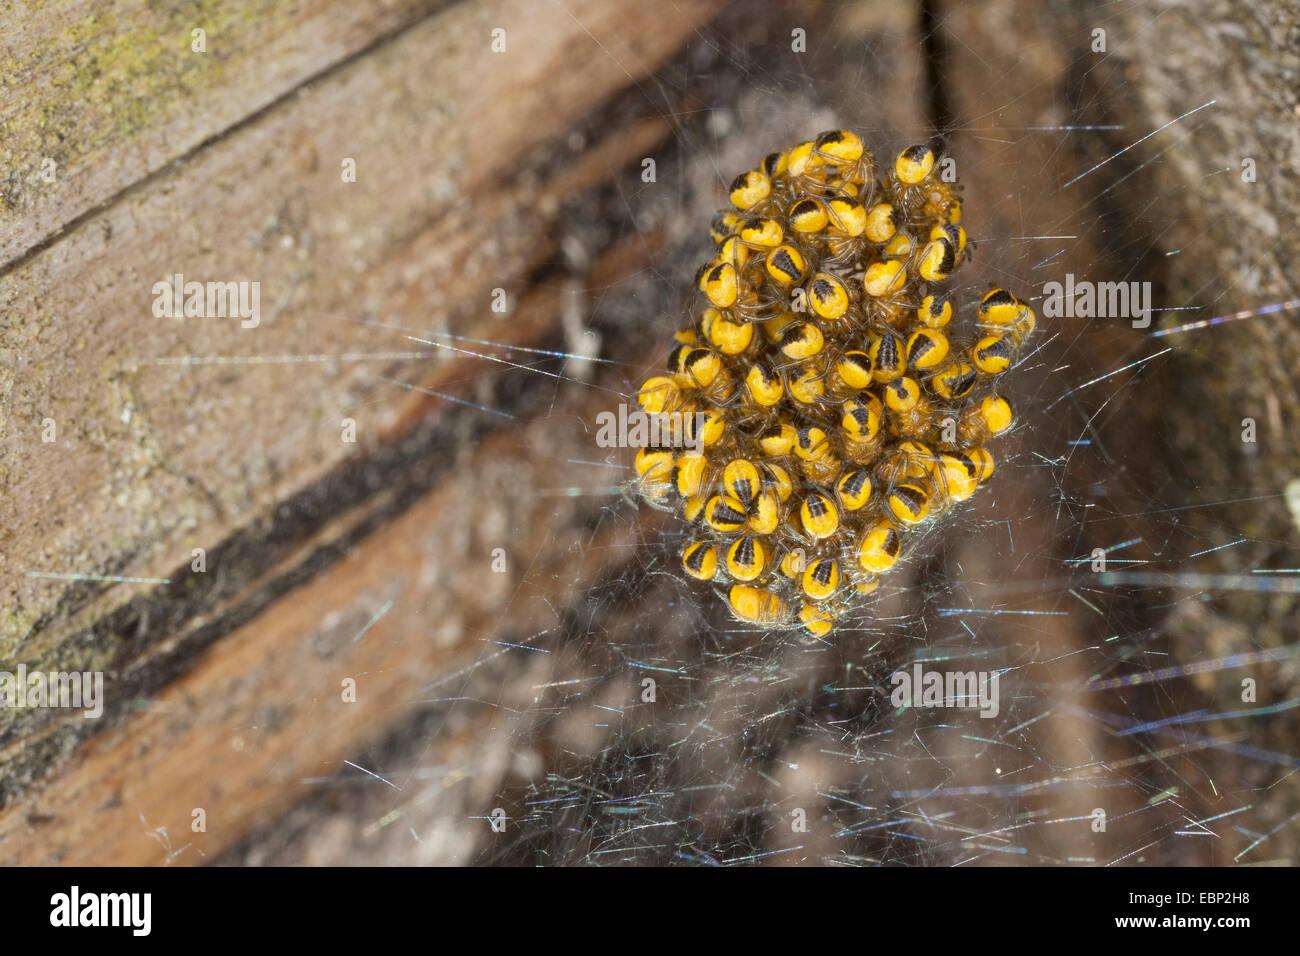 cross orbweaver, European garden spider, cross spider (Araneus diadematus), young spiders in a cocoon, Germany Stock Photo